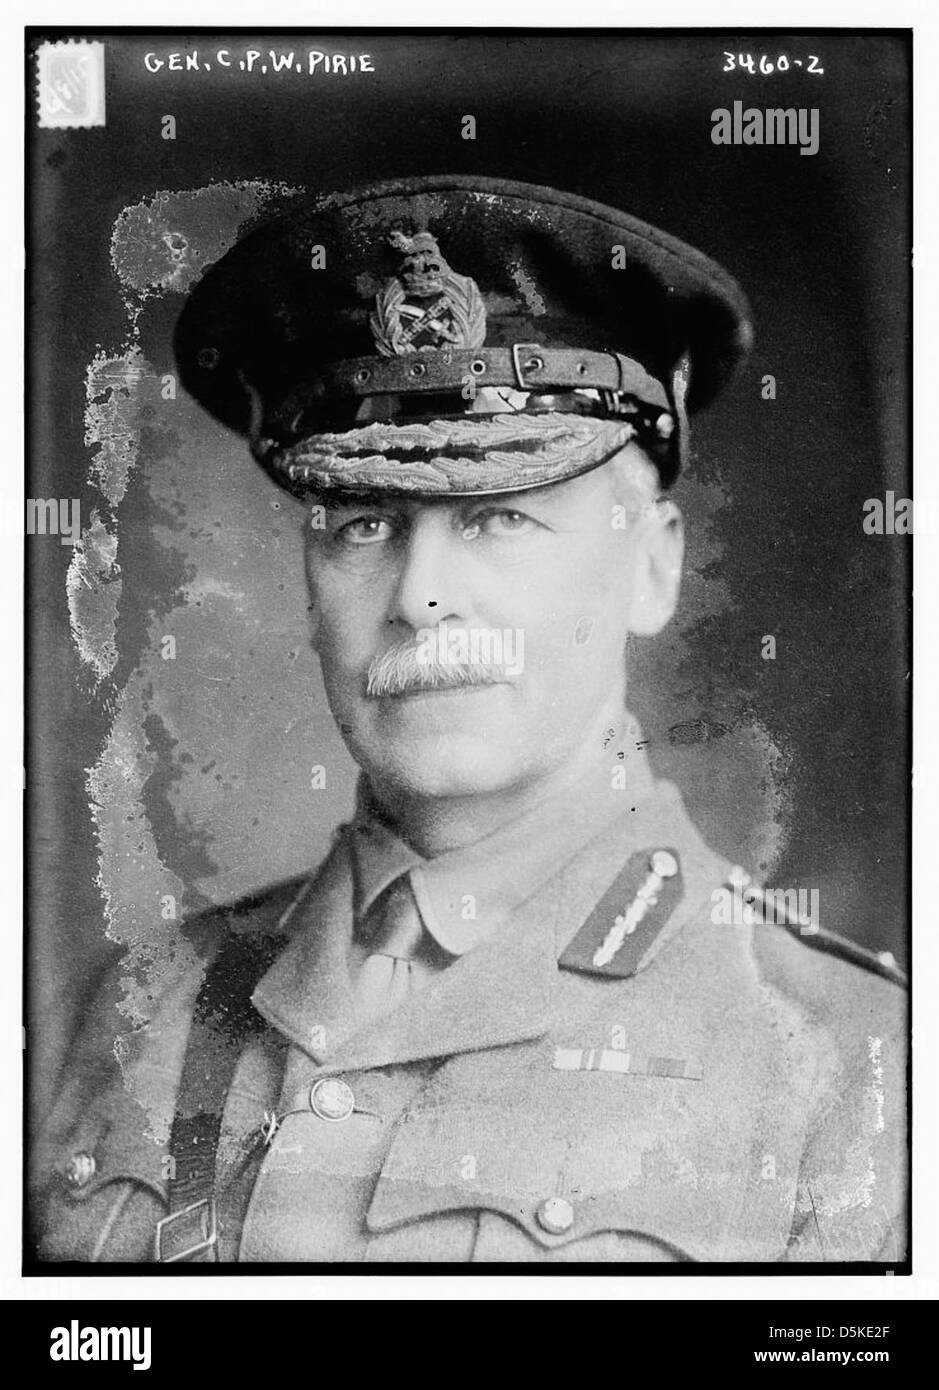 Gen. C.P. W. Pirie (LOC) - Stock Image